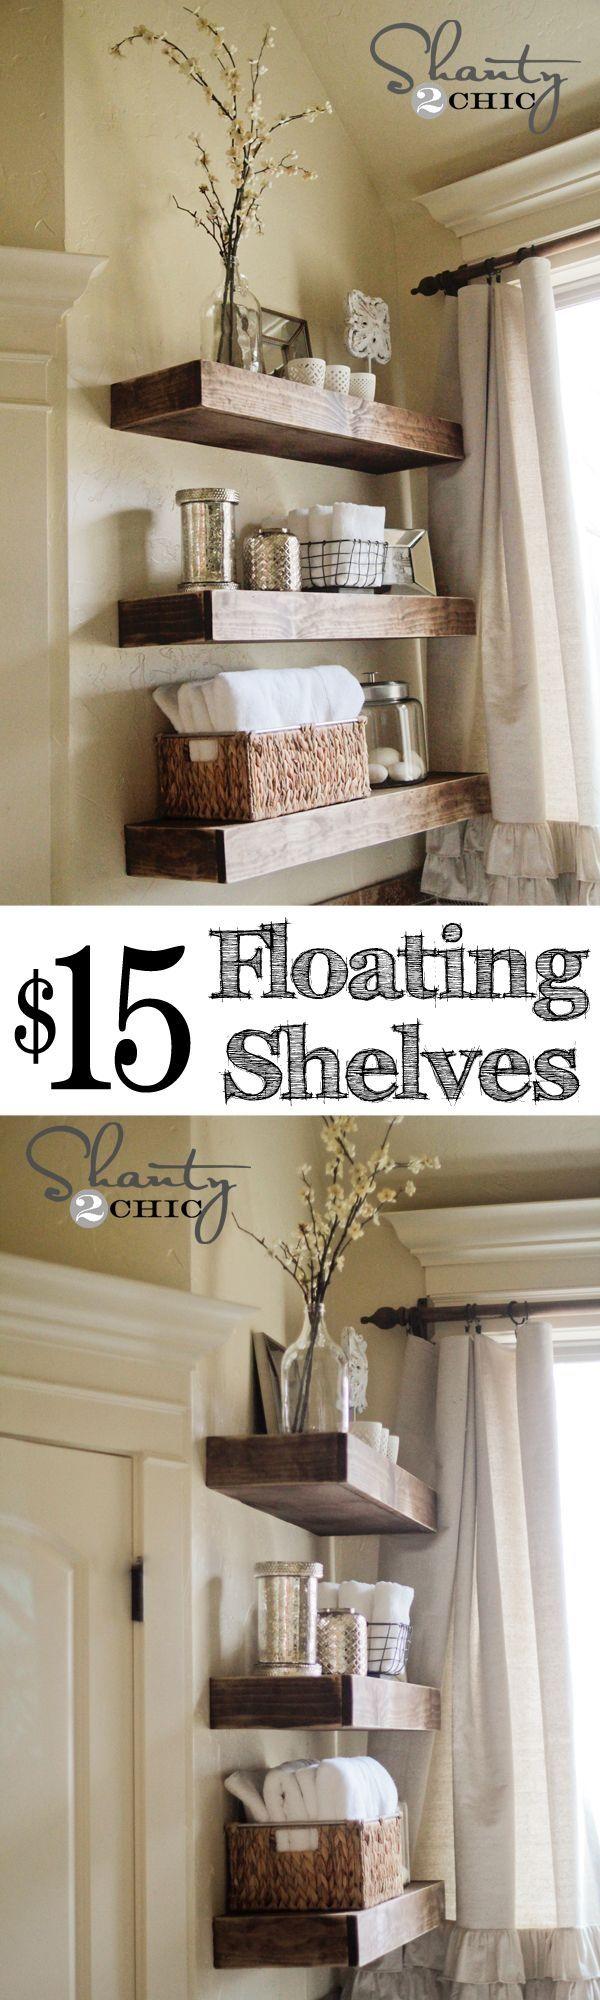 Super cute DIY Floating Shelves by kim.h.boyles.1